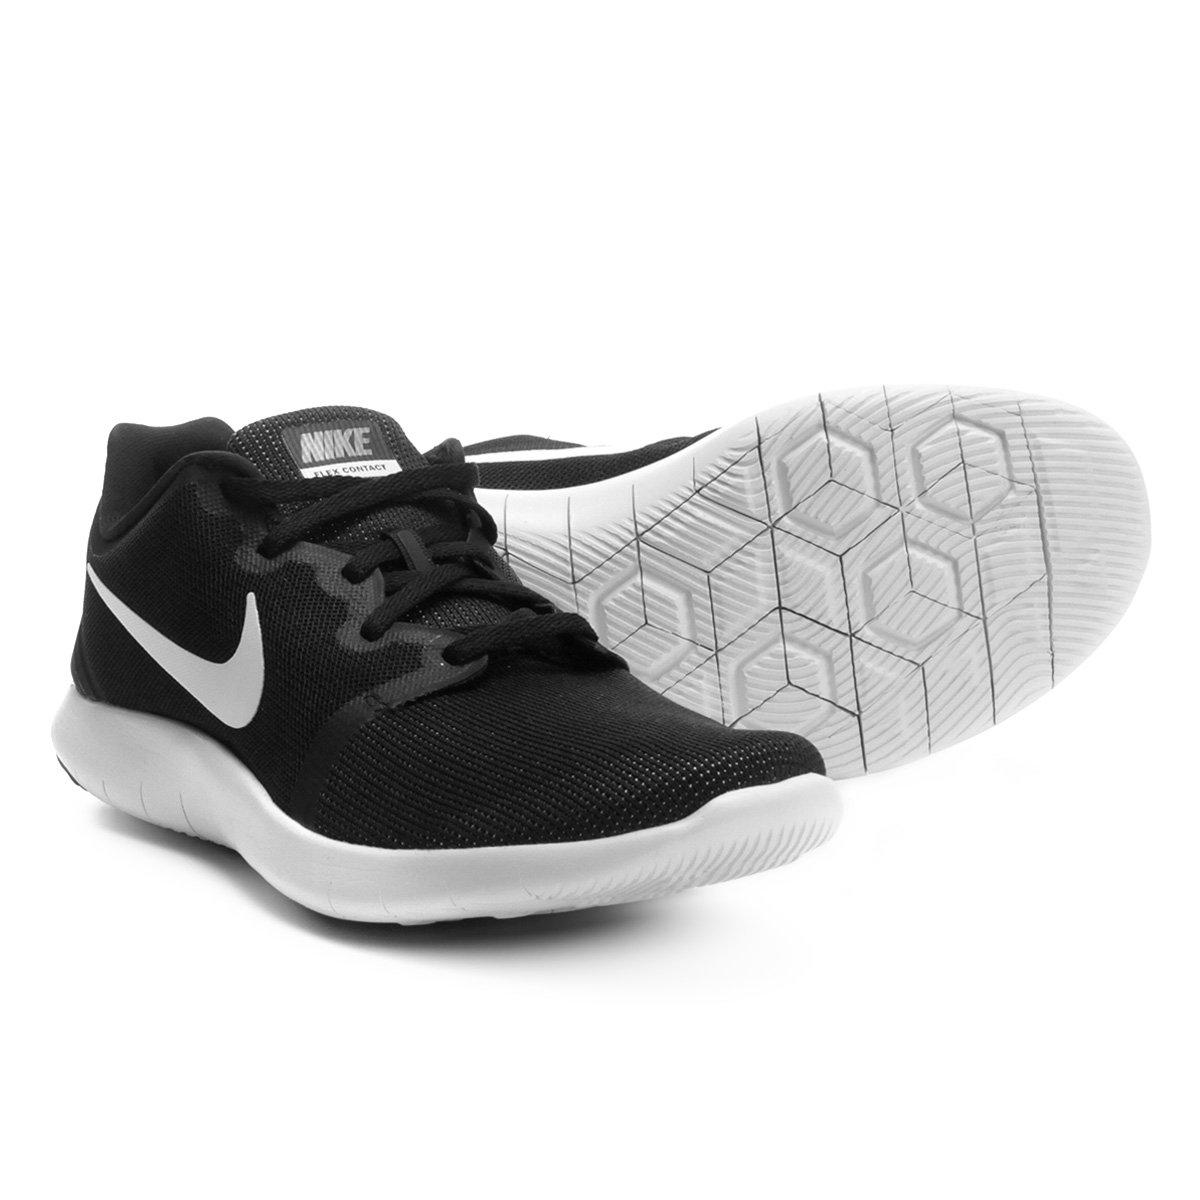 607e5417744 Tênis Nike Flex Contact 2 Masculino - Preto e Branco - Compre Agora ...